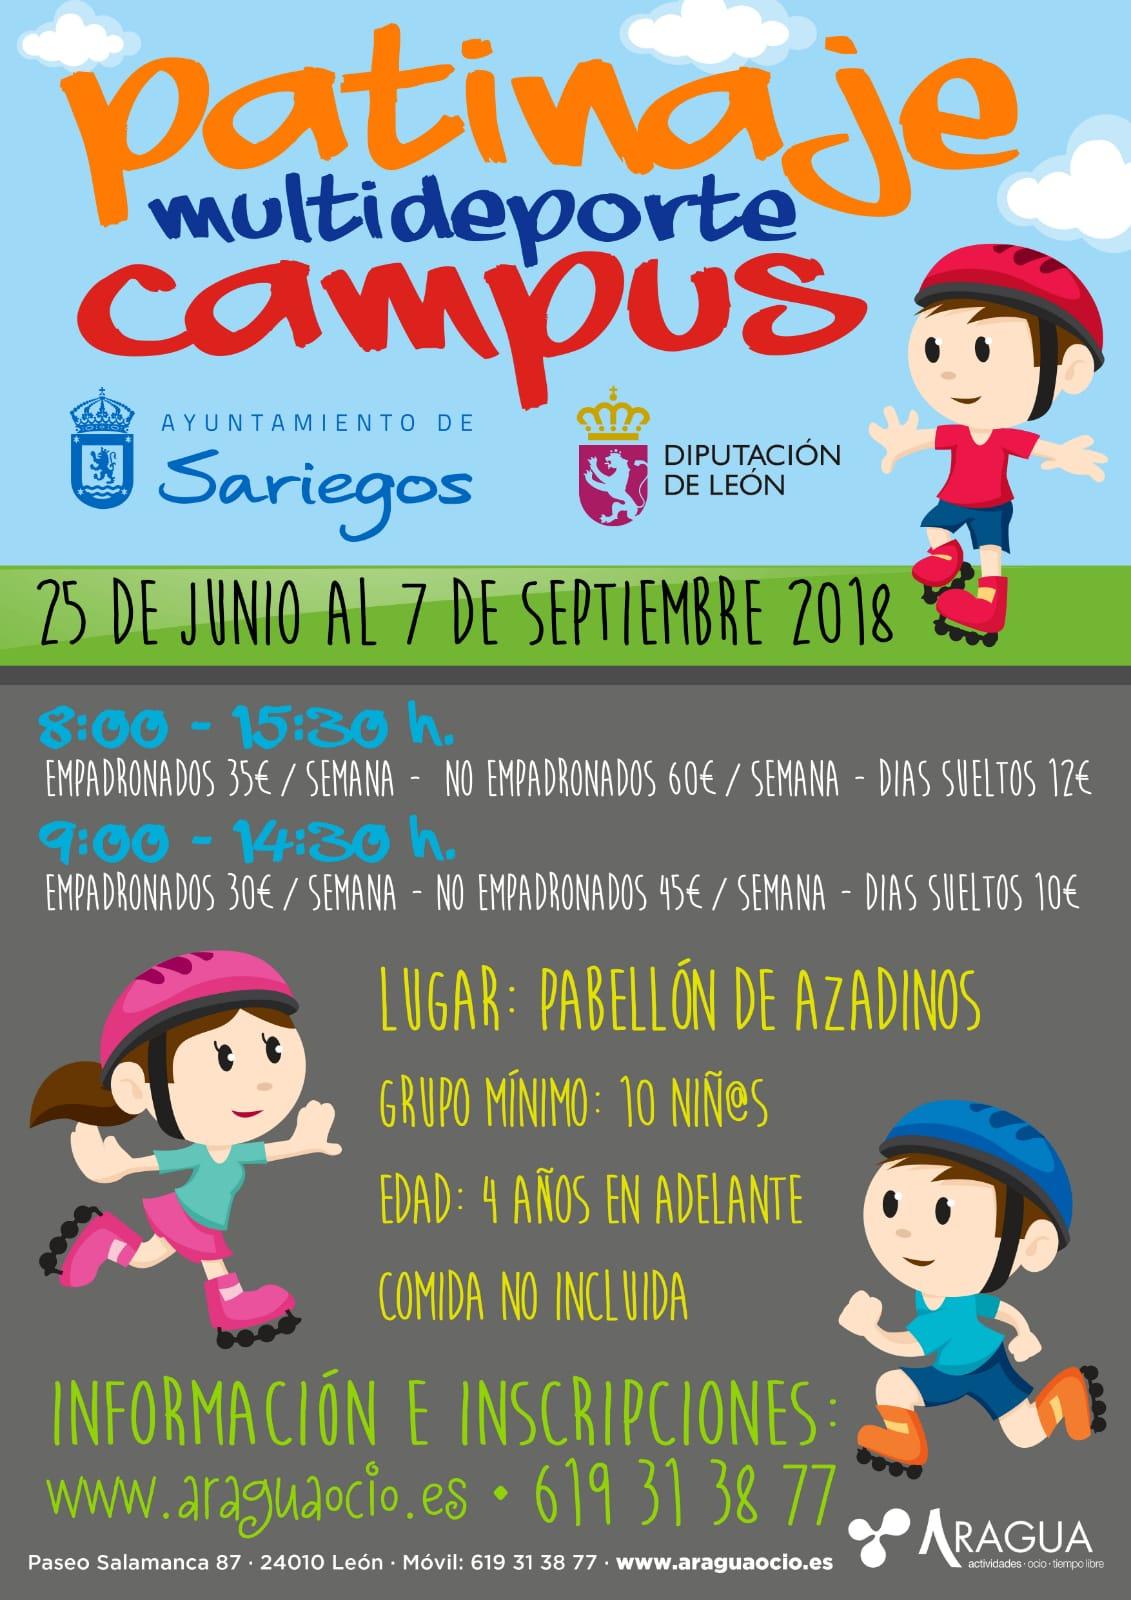 Campus Verano 2018 Deportivos. Multideporte Patinaje